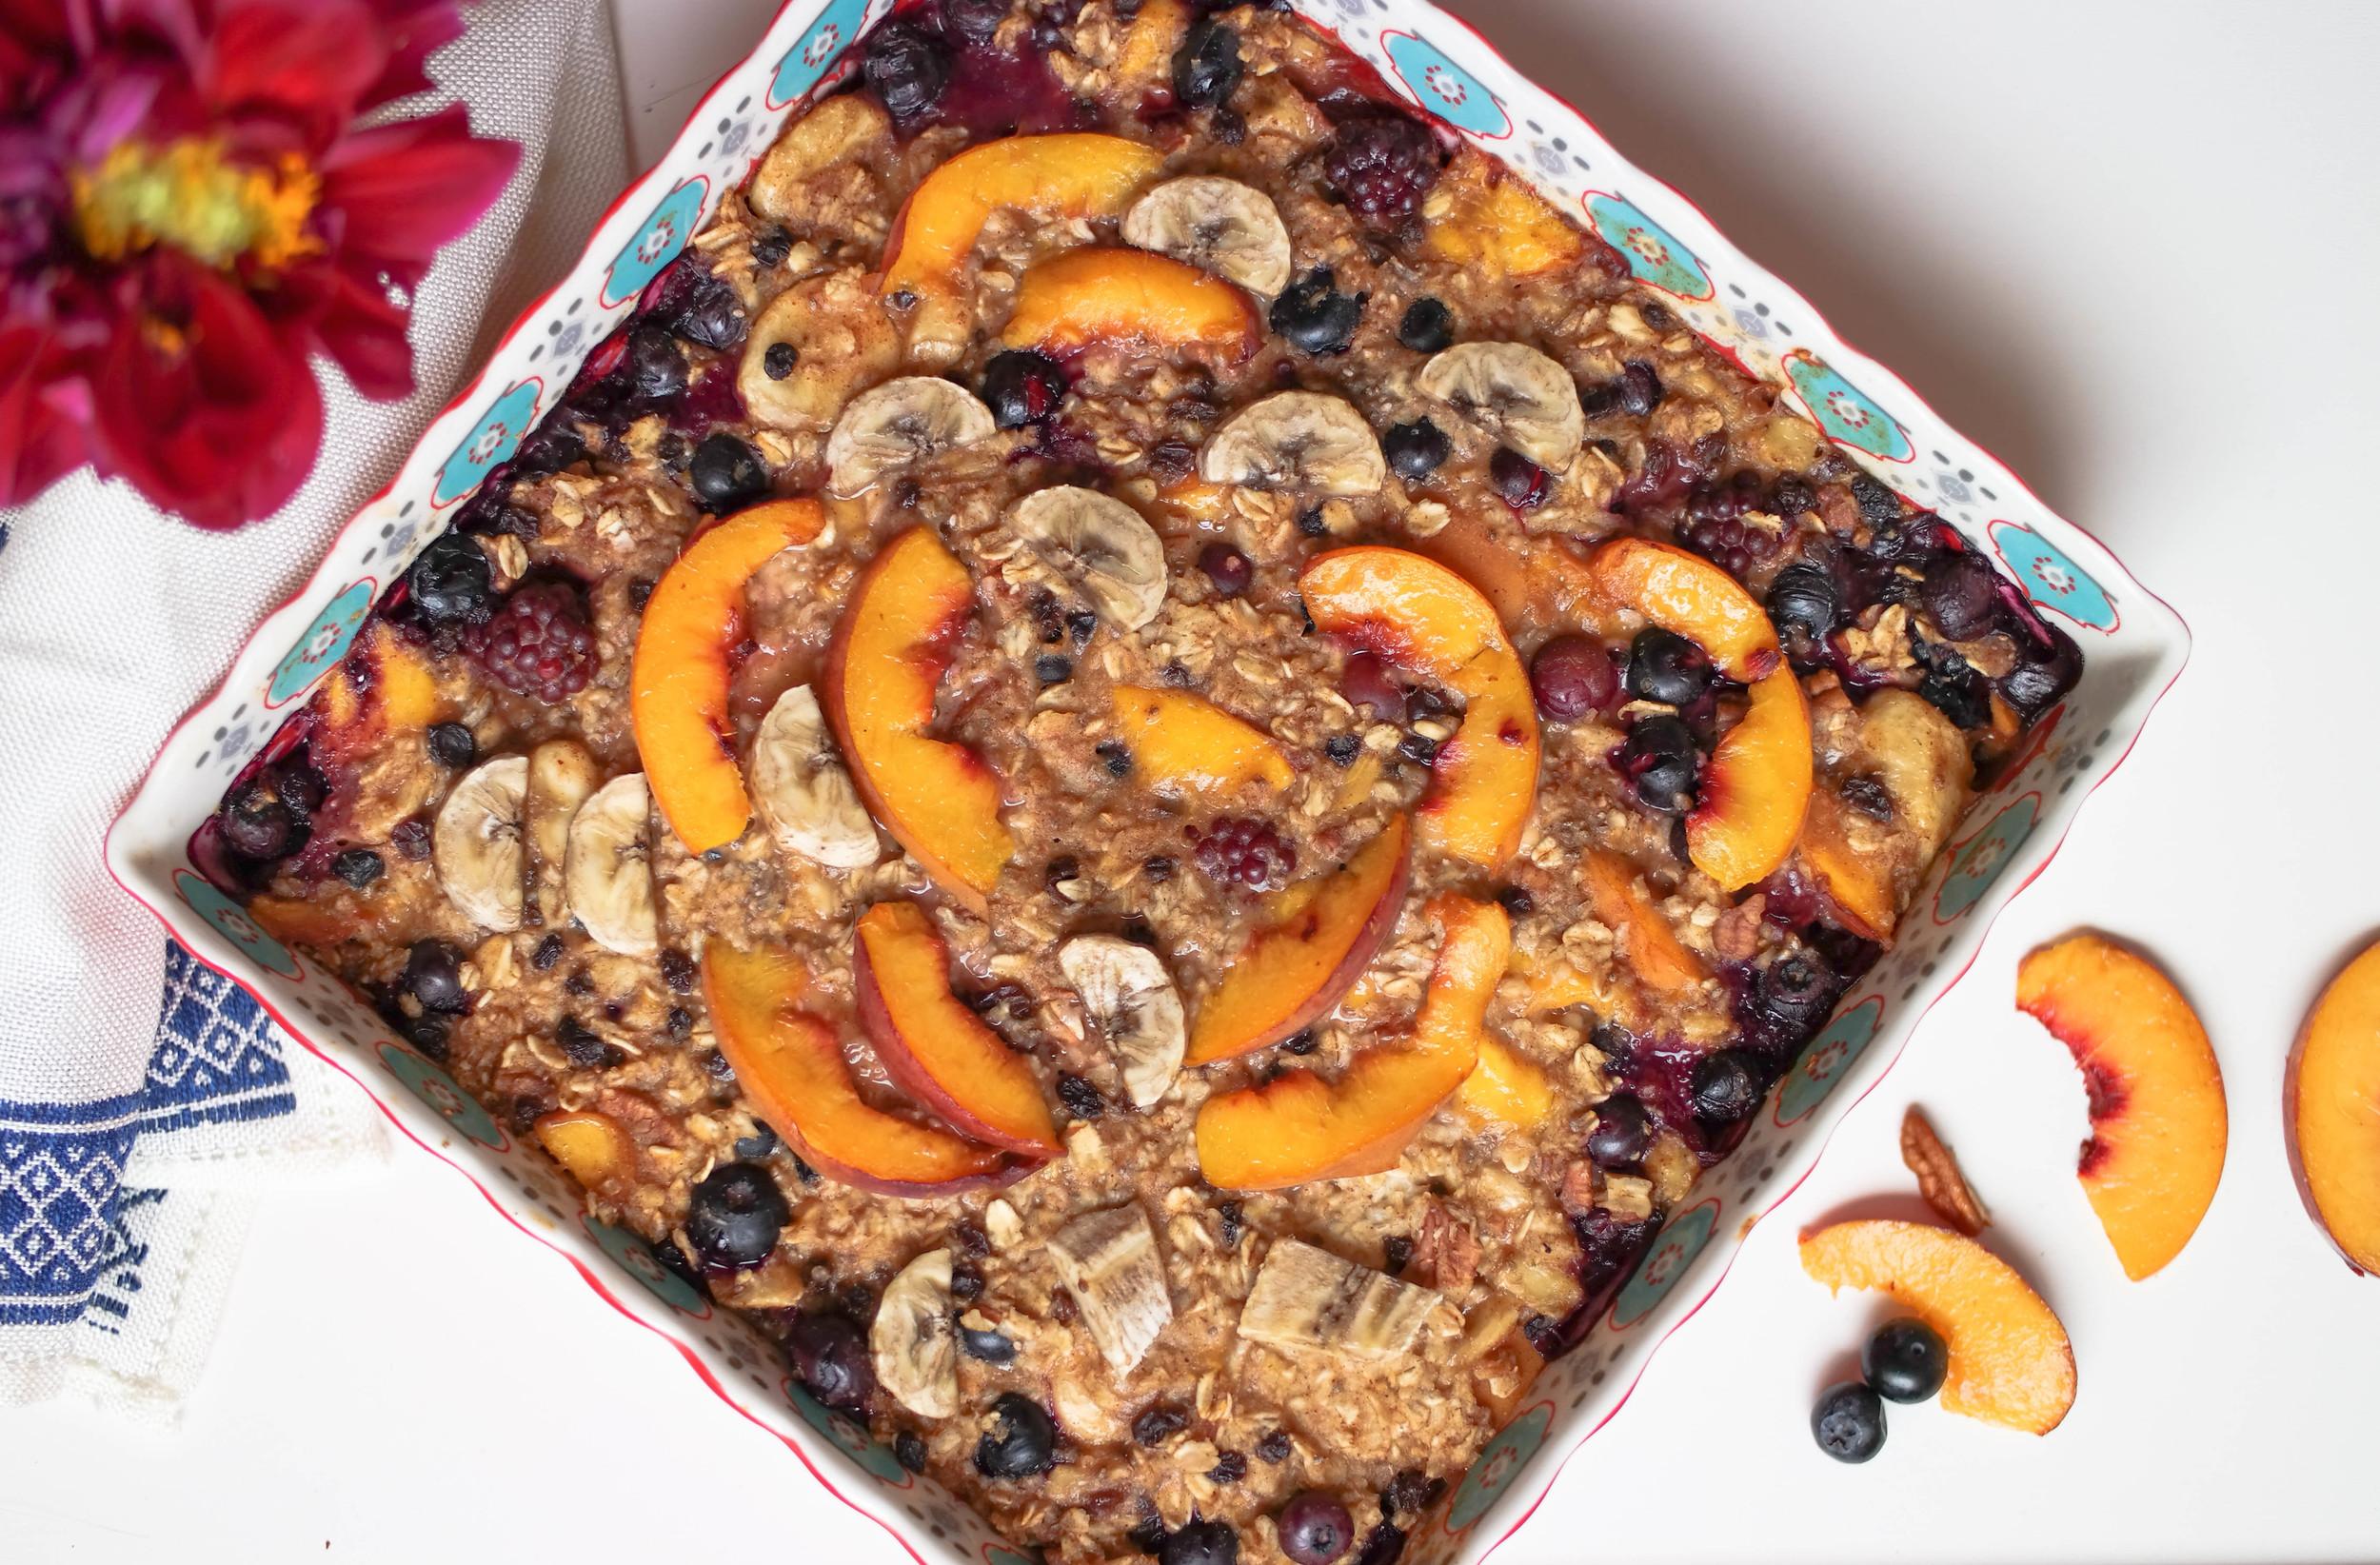 5-Baked-Peach-And-Blueberry-Oatmeal | www.8thandlake.com